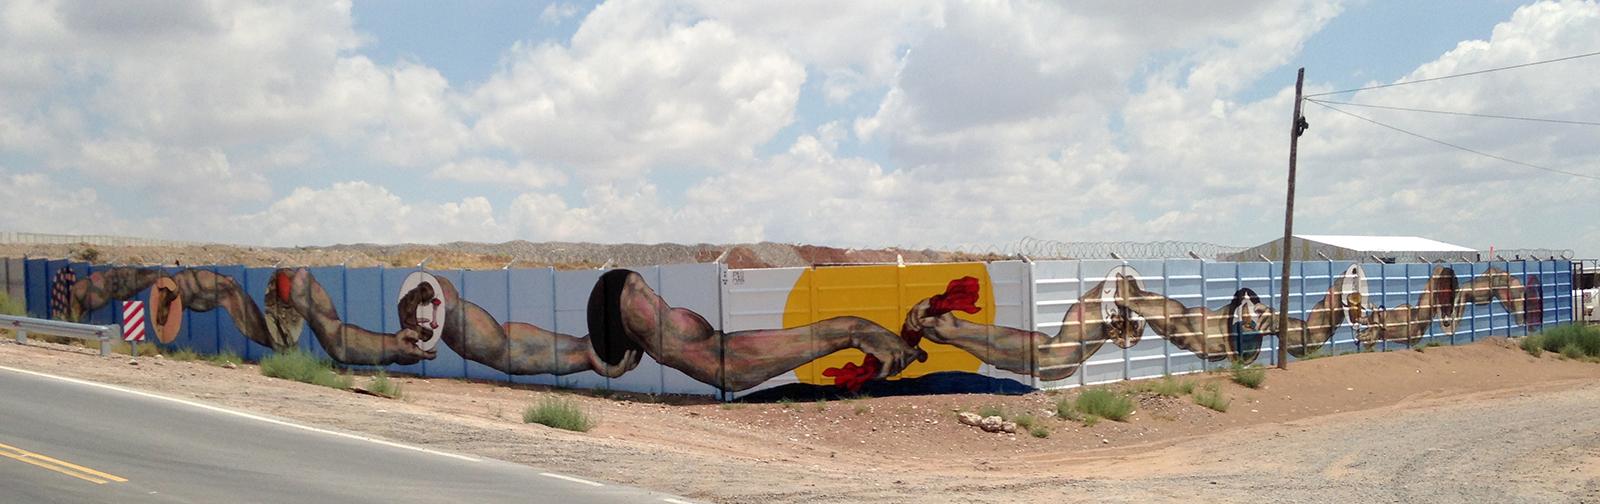 plumas-new-mural-in-neuquen-argentina-01